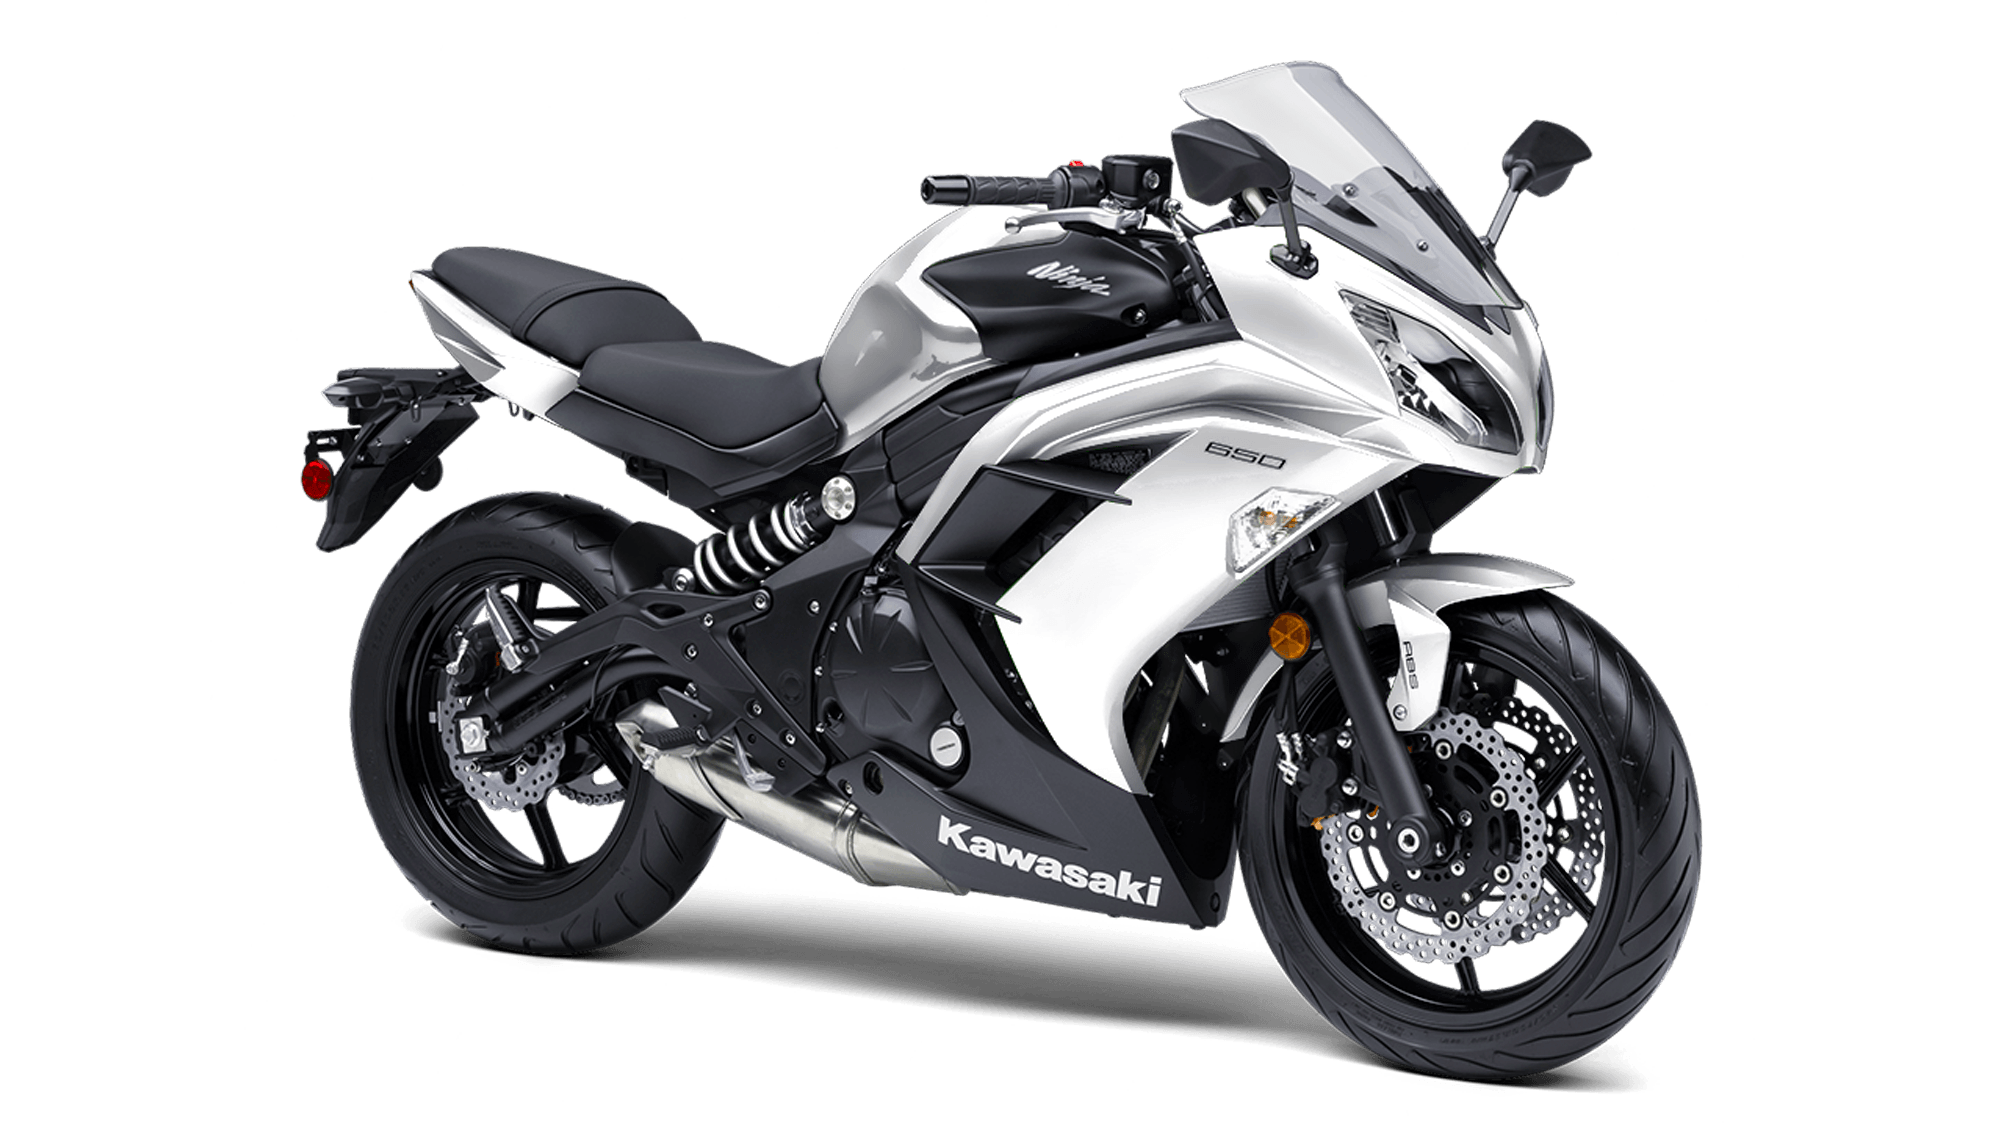 Check Out The Kawasaki 2015 Ninja 650 Abs Ninja 650 Kawasaki Kawasaki Motor